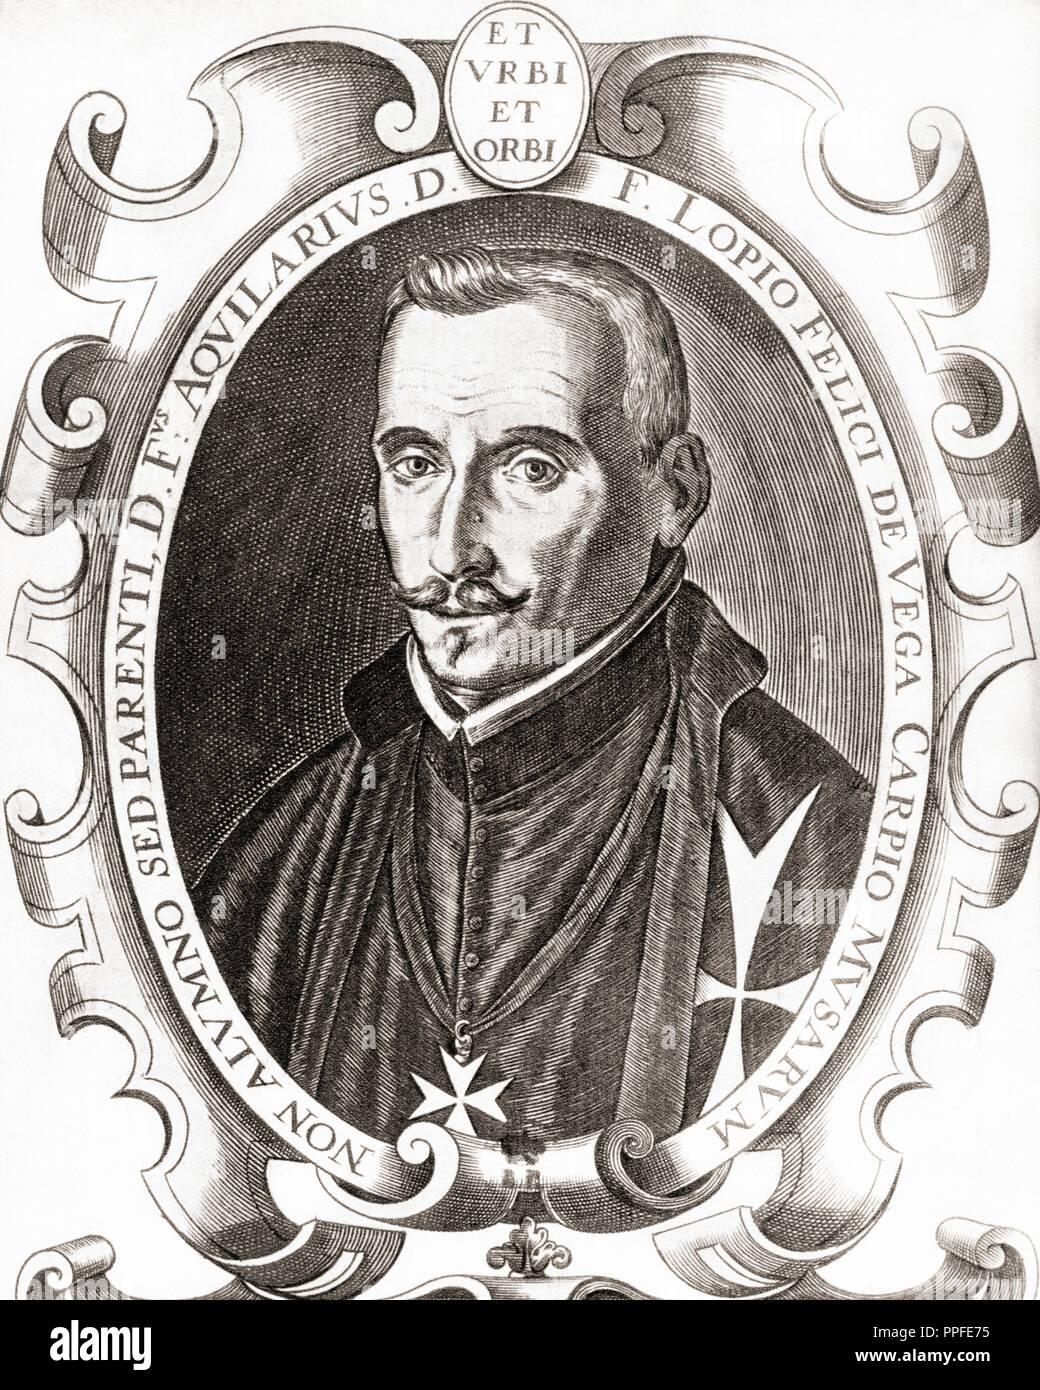 Lope Félix de Vega y Carpio, 1562 – 1635.  Spanish playwright, poet, novelist and marine. - Stock Image